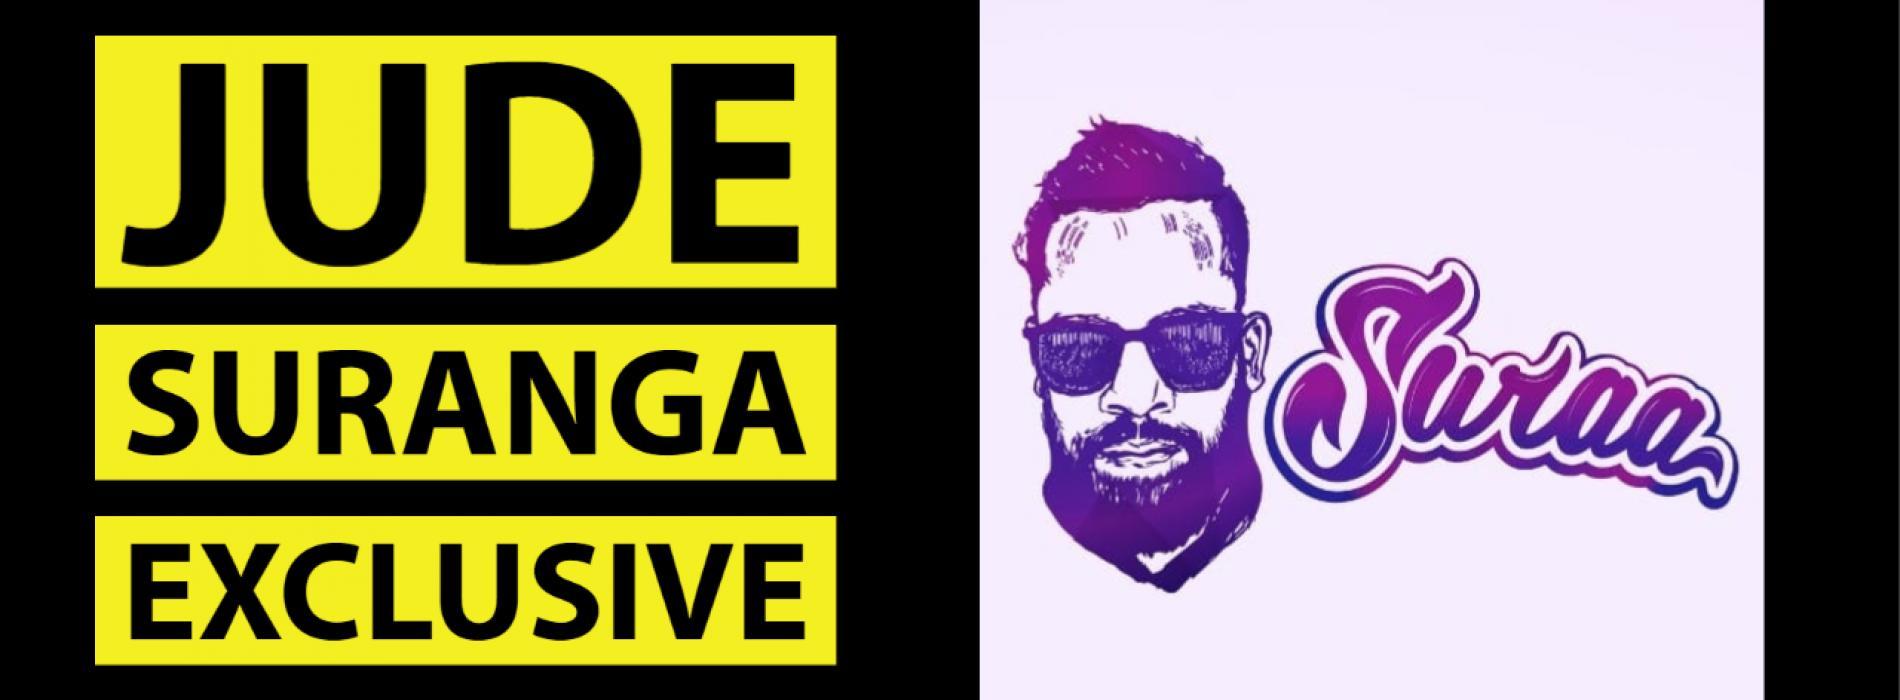 Exclusive : Jude Suranga